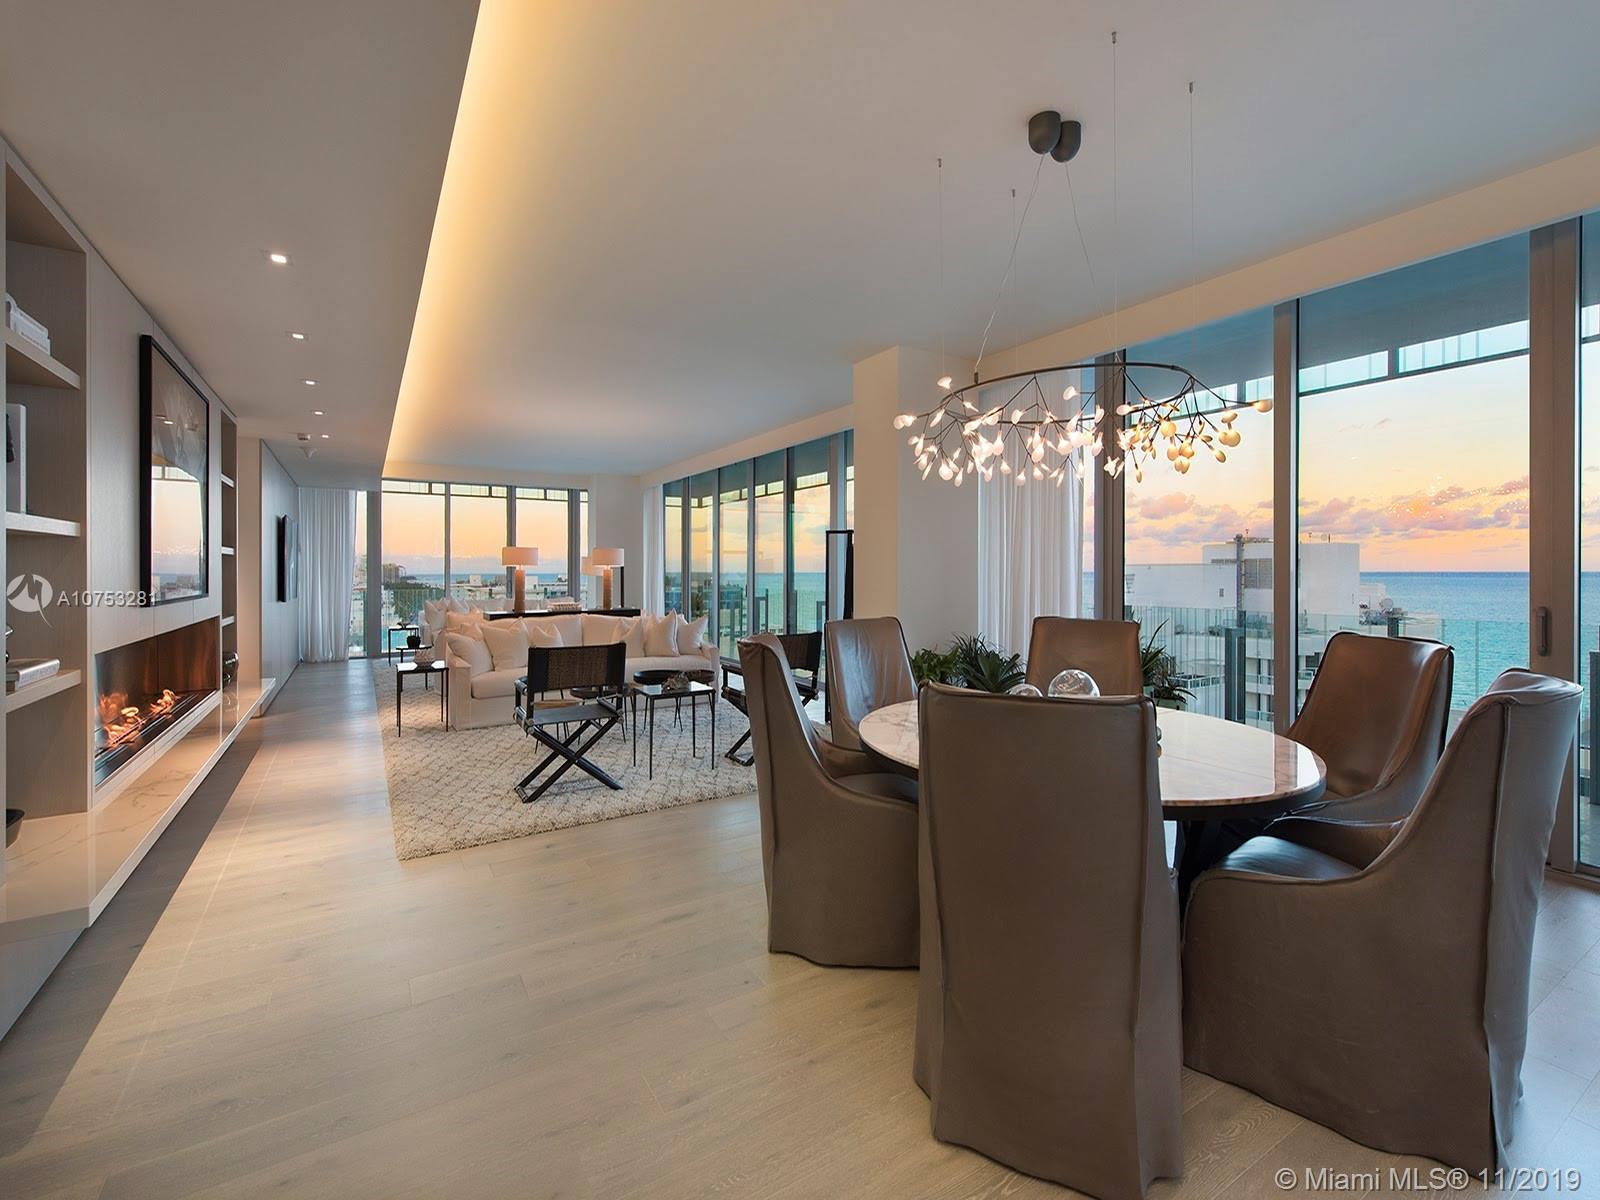 120 Ocean Dr, Unit #1200 Luxury Real Estate